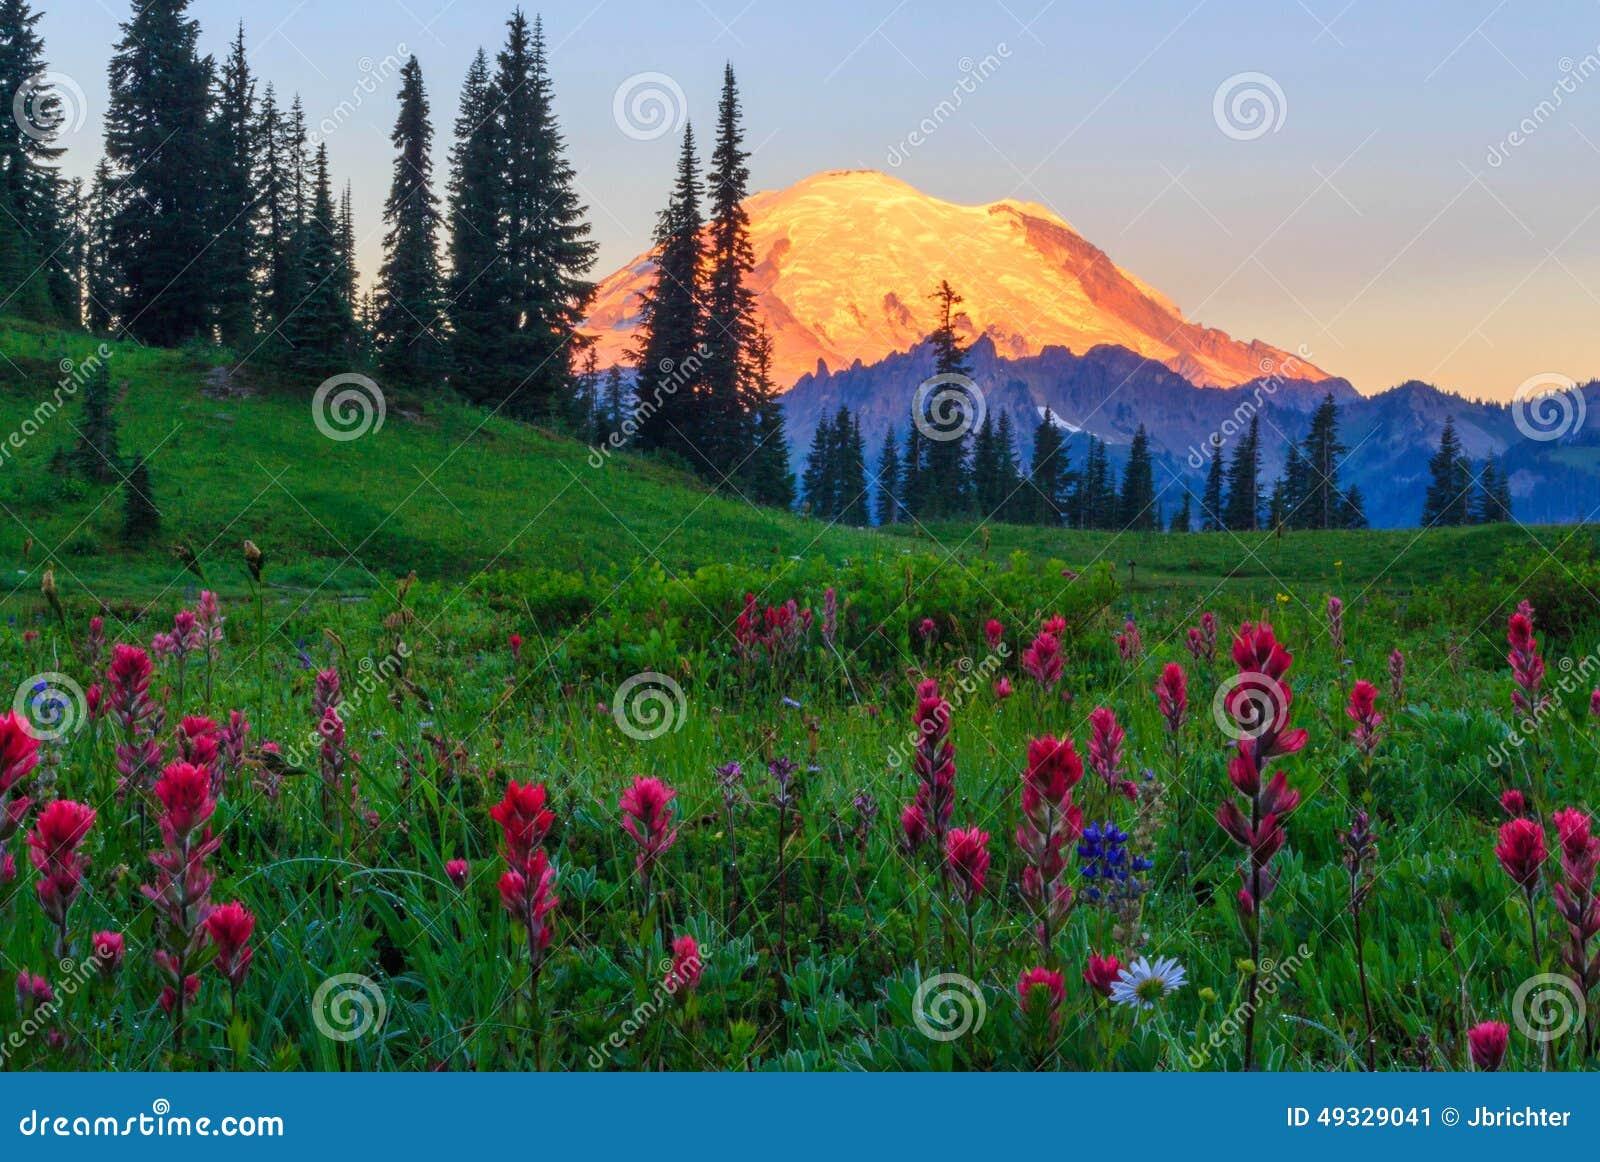 Alpiene Gloed op MT Regenachtiger, Washington State